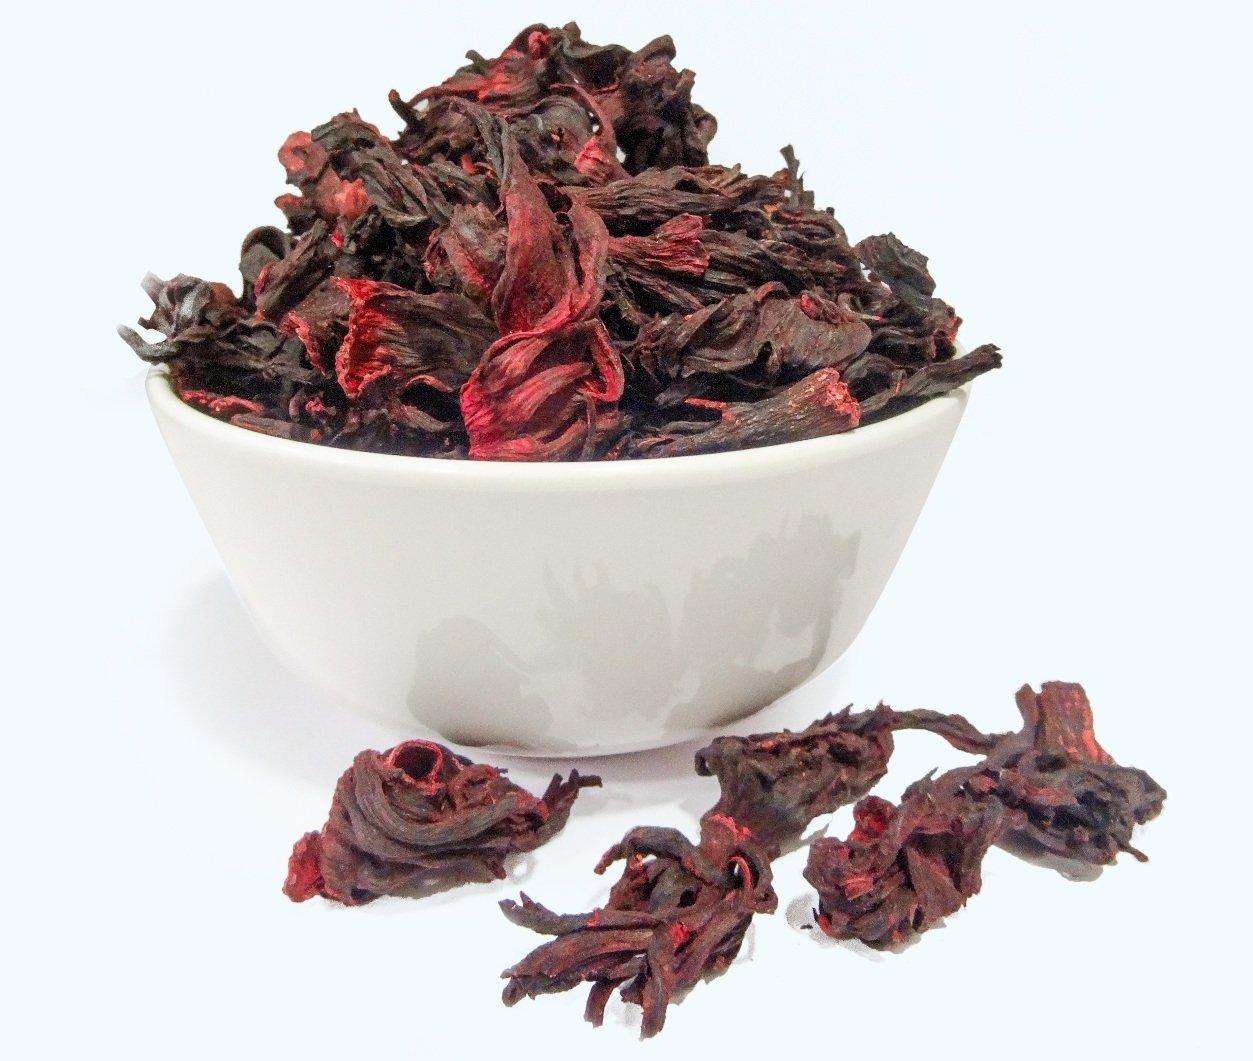 Earth Expo Company Dry Hibiscus Flower 100 Pure 100 Gm Amazon